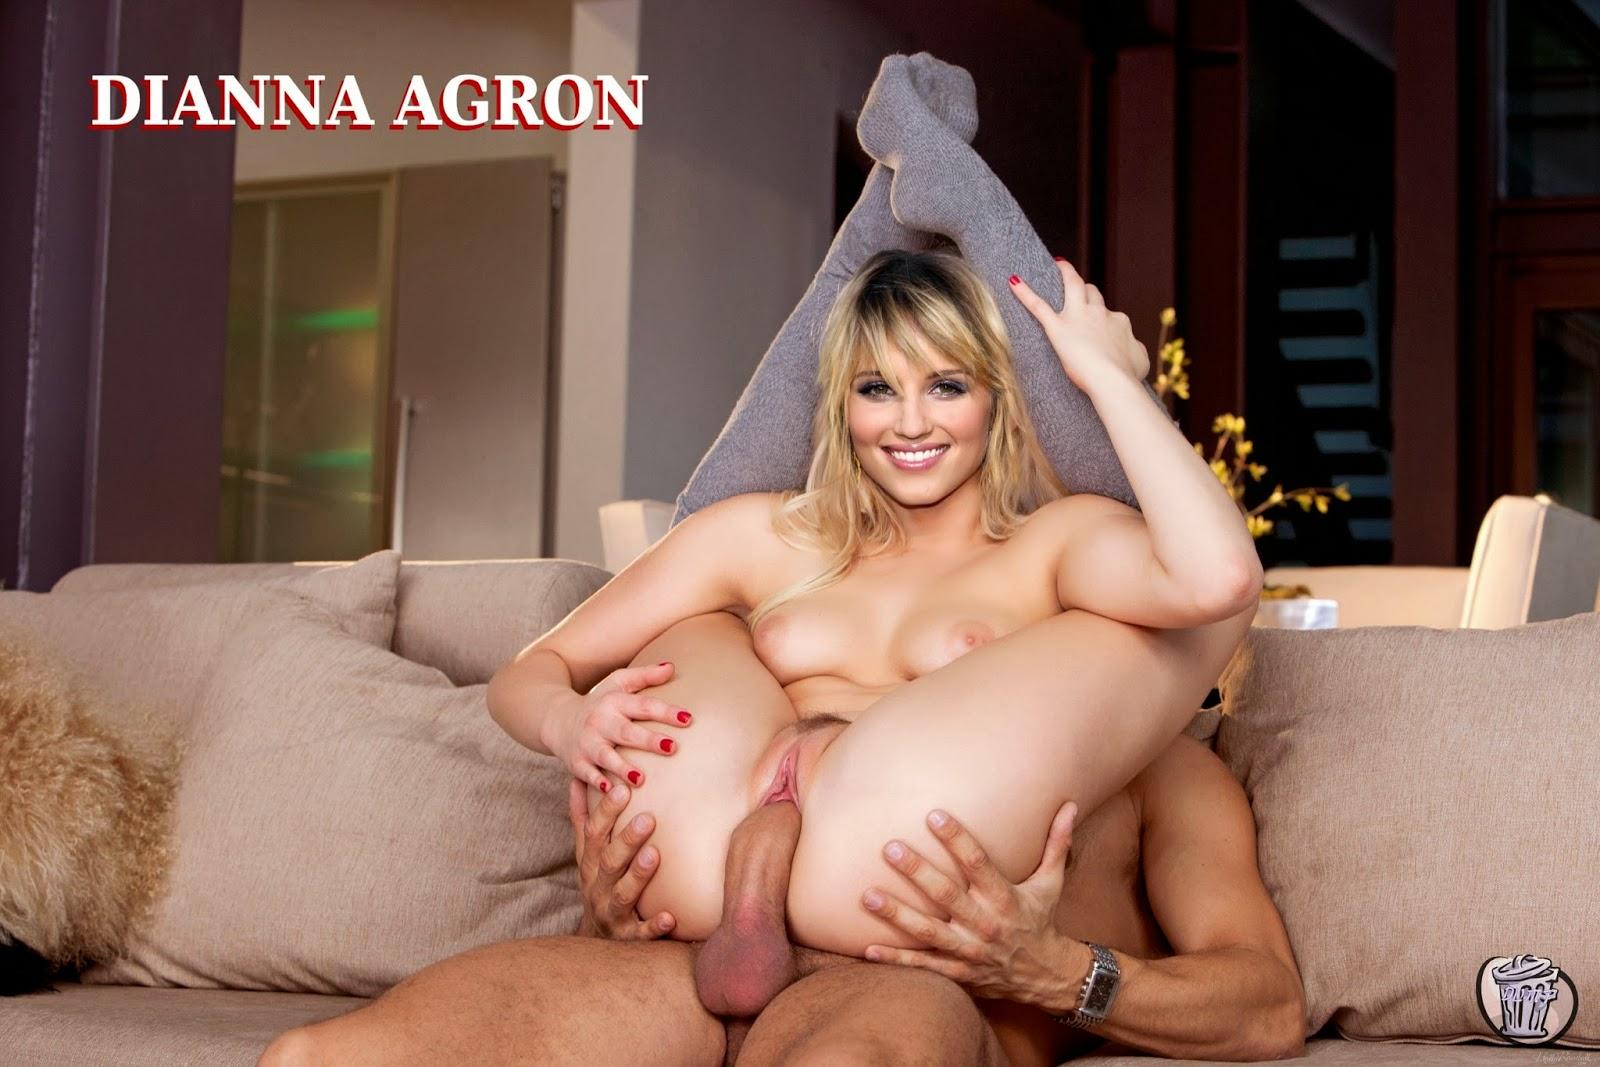 Remarkable, Anna williams naked photos really